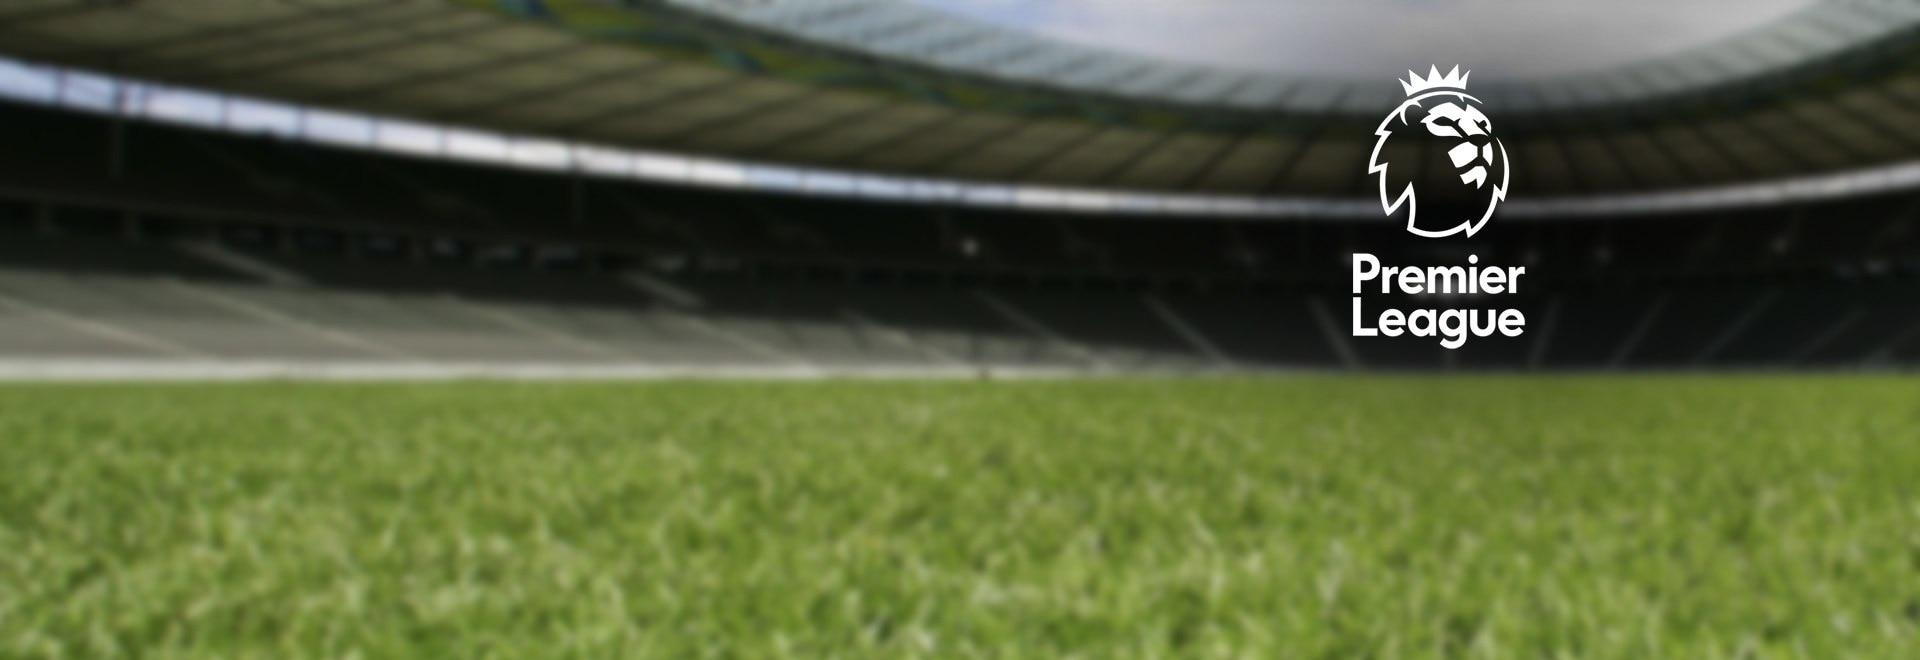 Premier League - Stag. 2020 Ep. 12a g. - Newcastle United - West Bromwich Albion